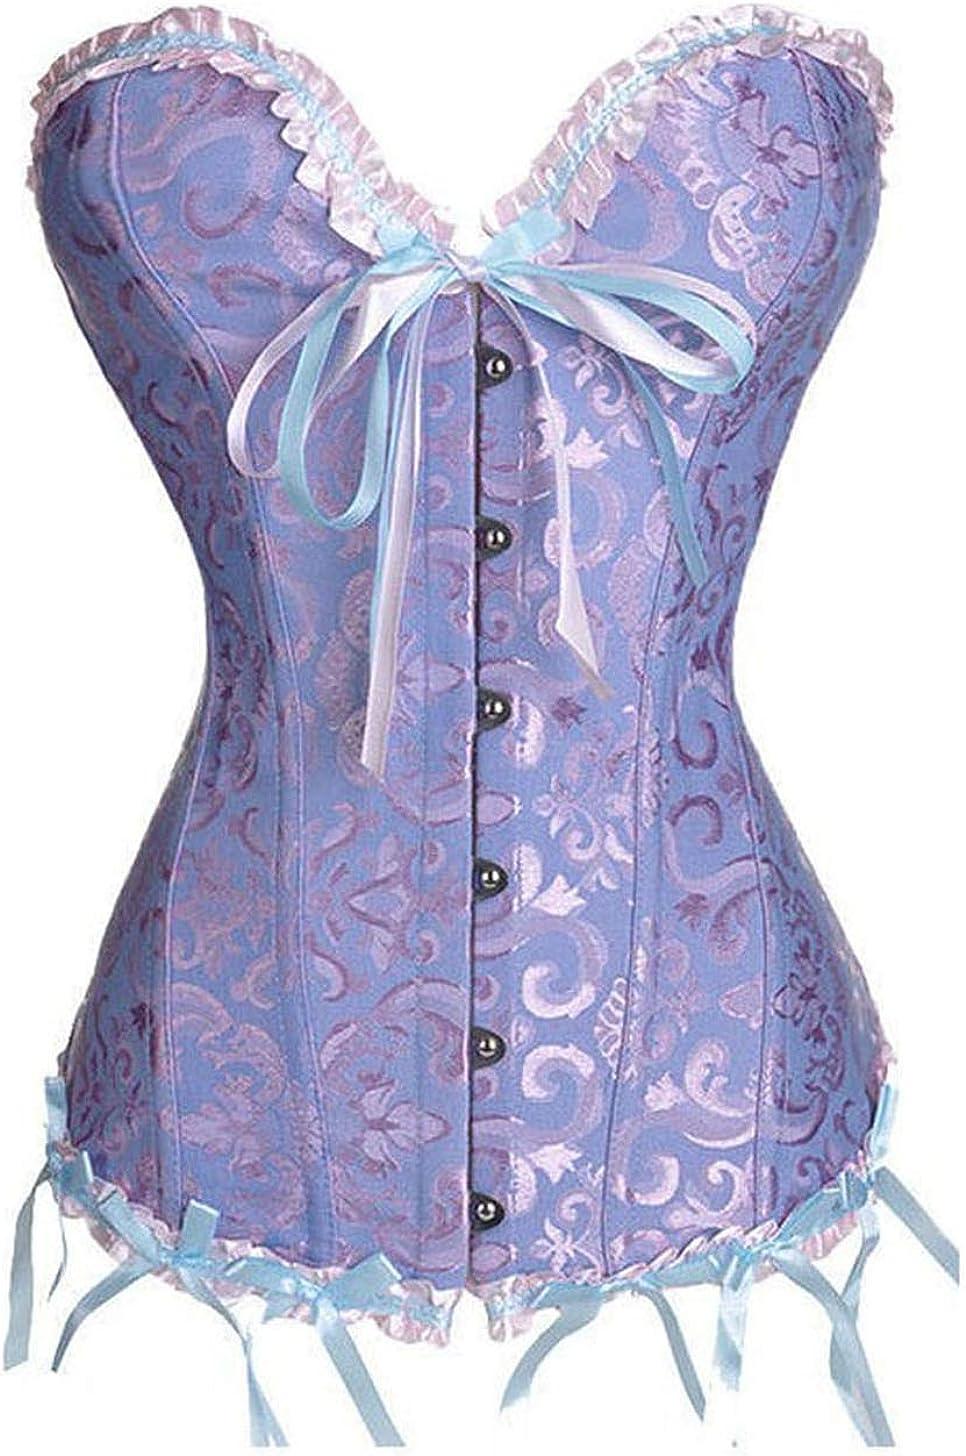 Women 's Renaissance Corset Belt Top Sexy Max 47% OFF Shap Max 47% OFF Waist Floral Lace